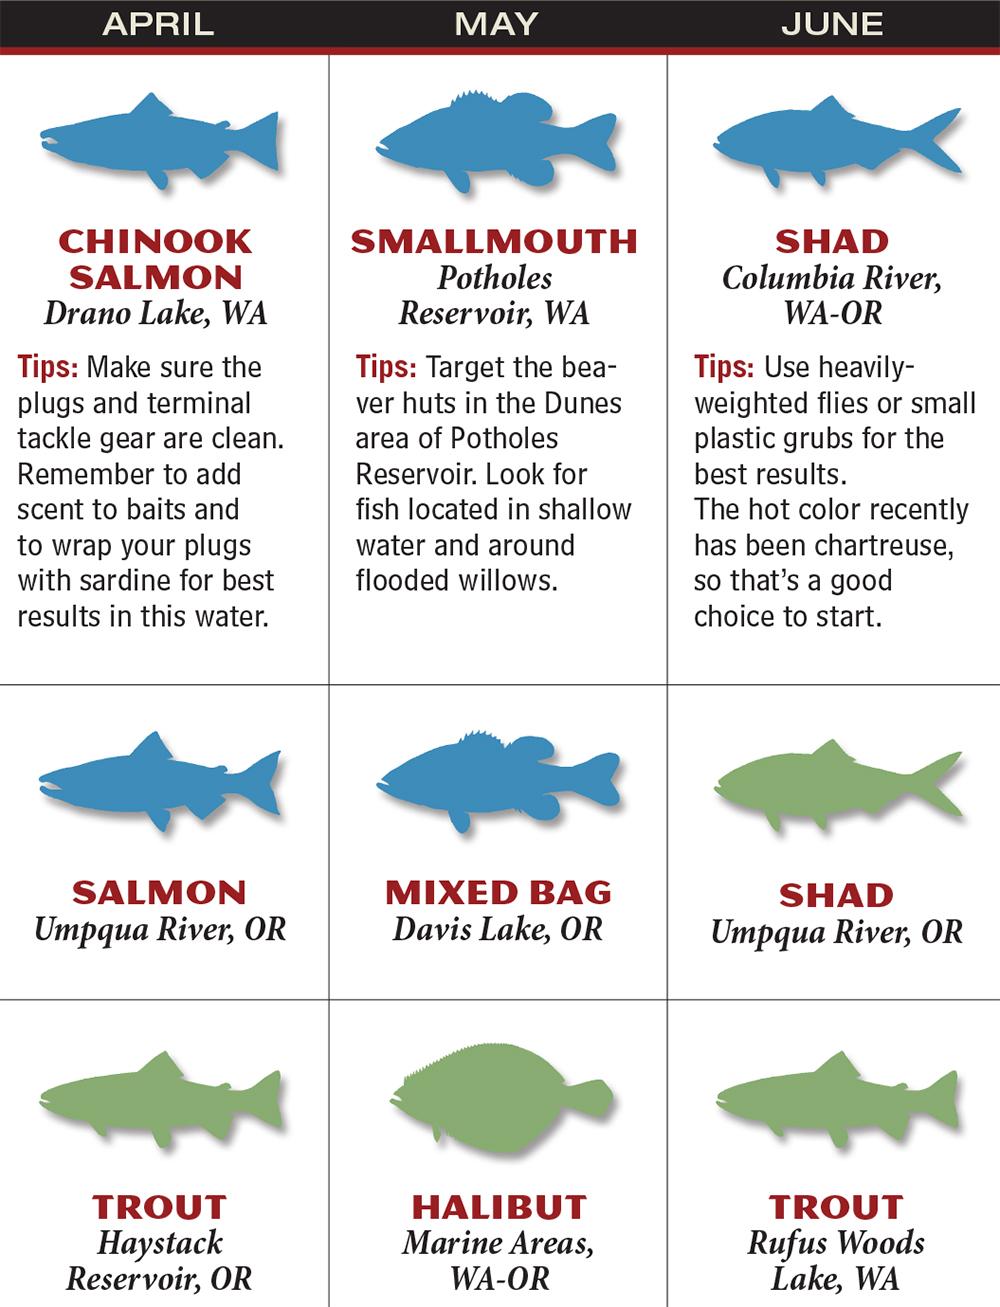 Washington and oregon 2016 fishing calendar game fish for Fishing forecast calendar